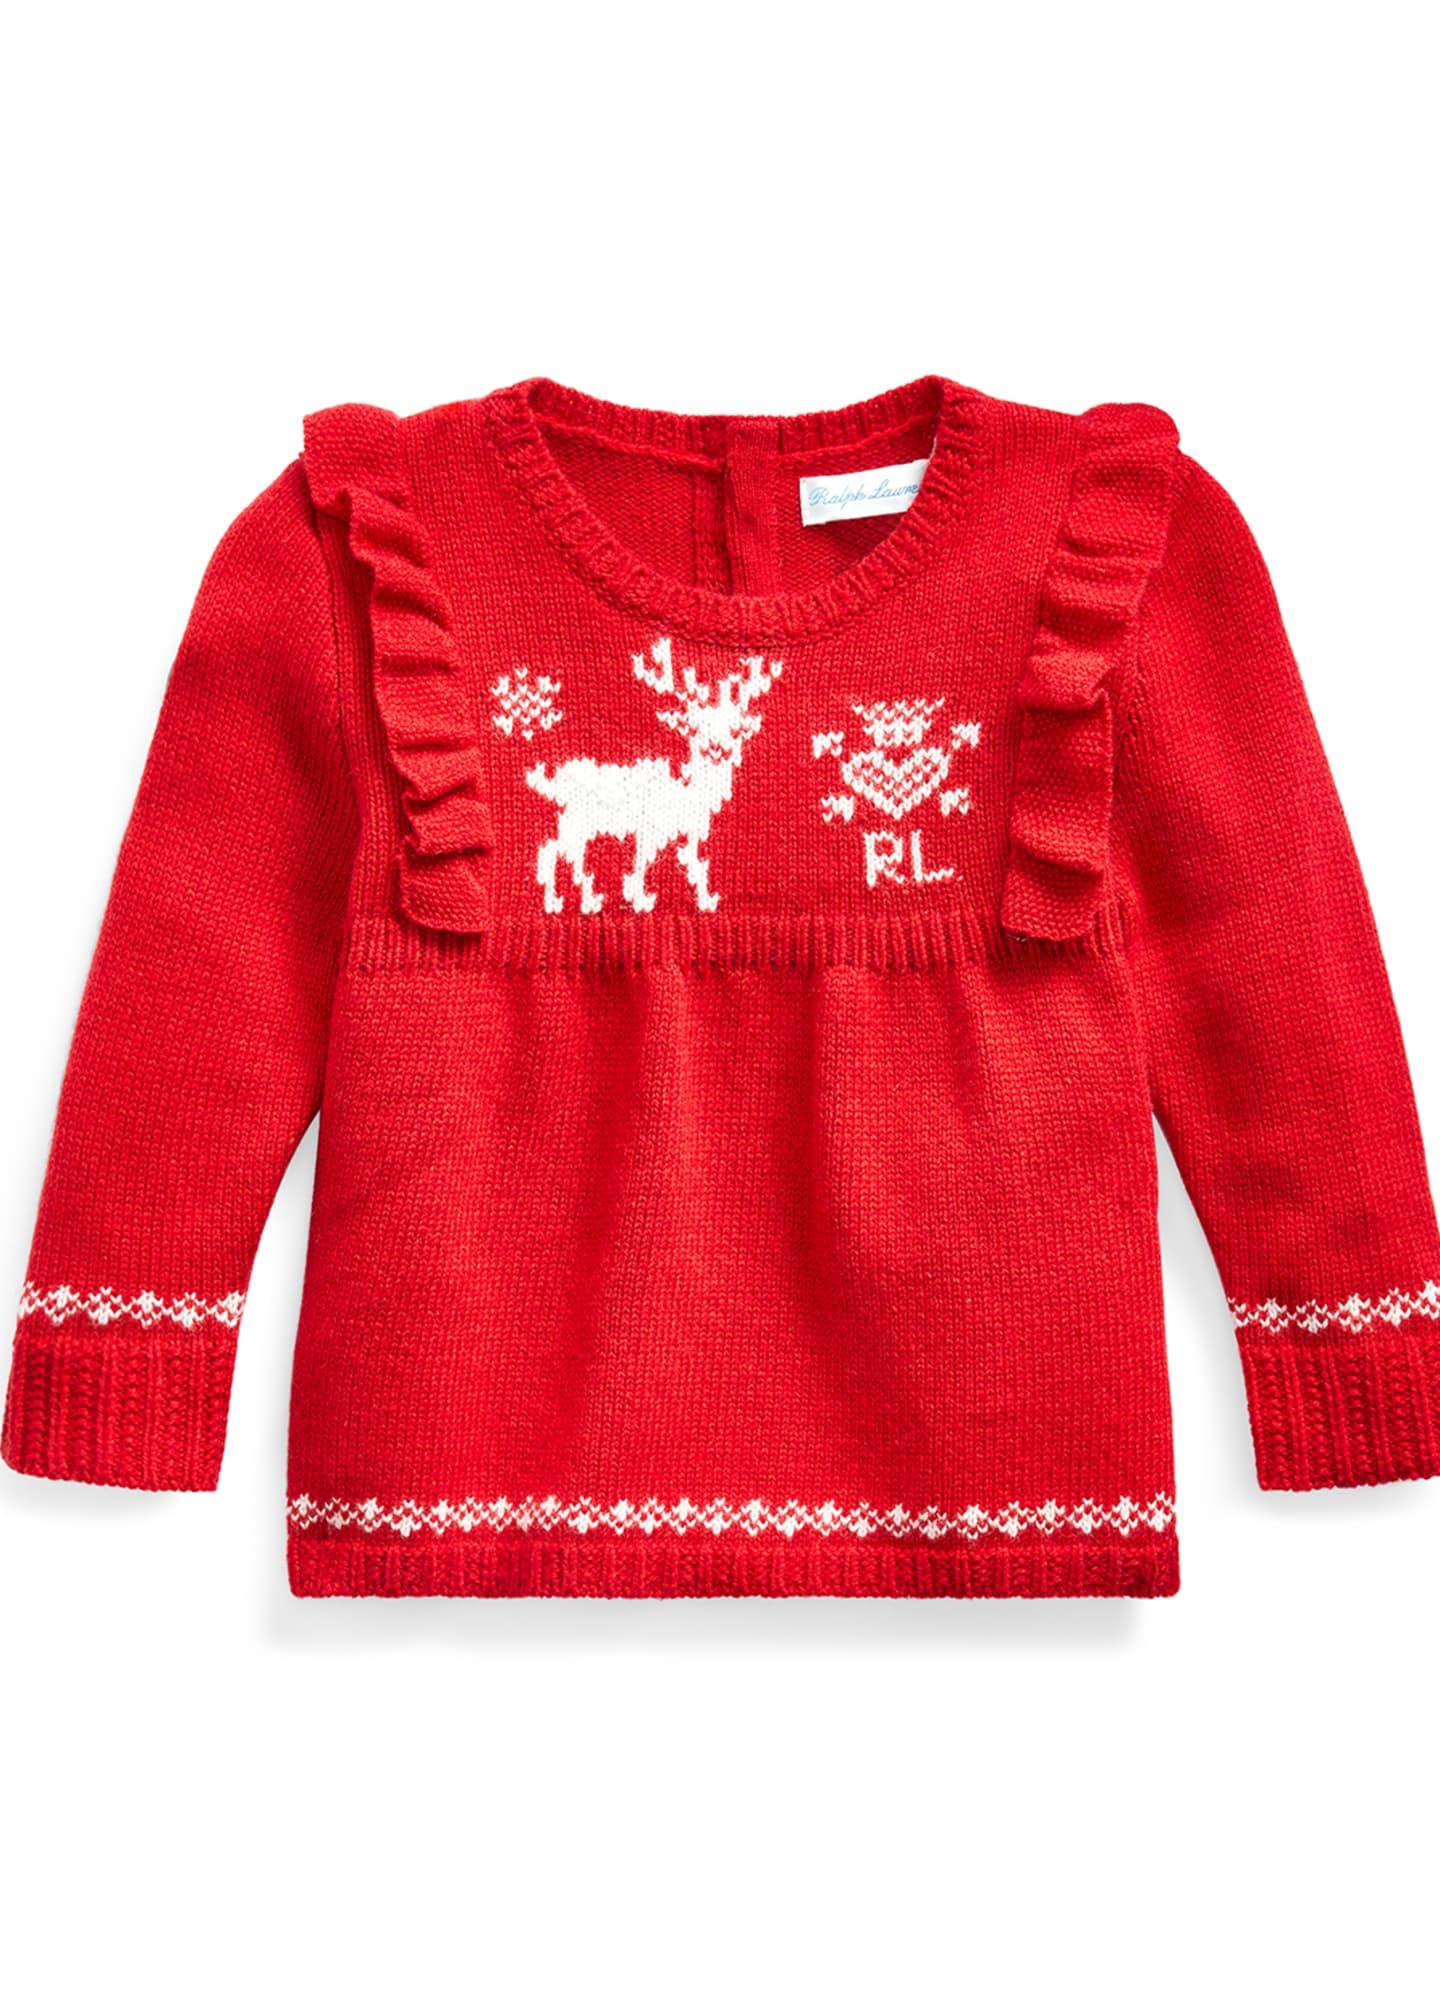 Ralph Lauren Childrenswear Girl's Reindeer Intarsia Ruffle Trim